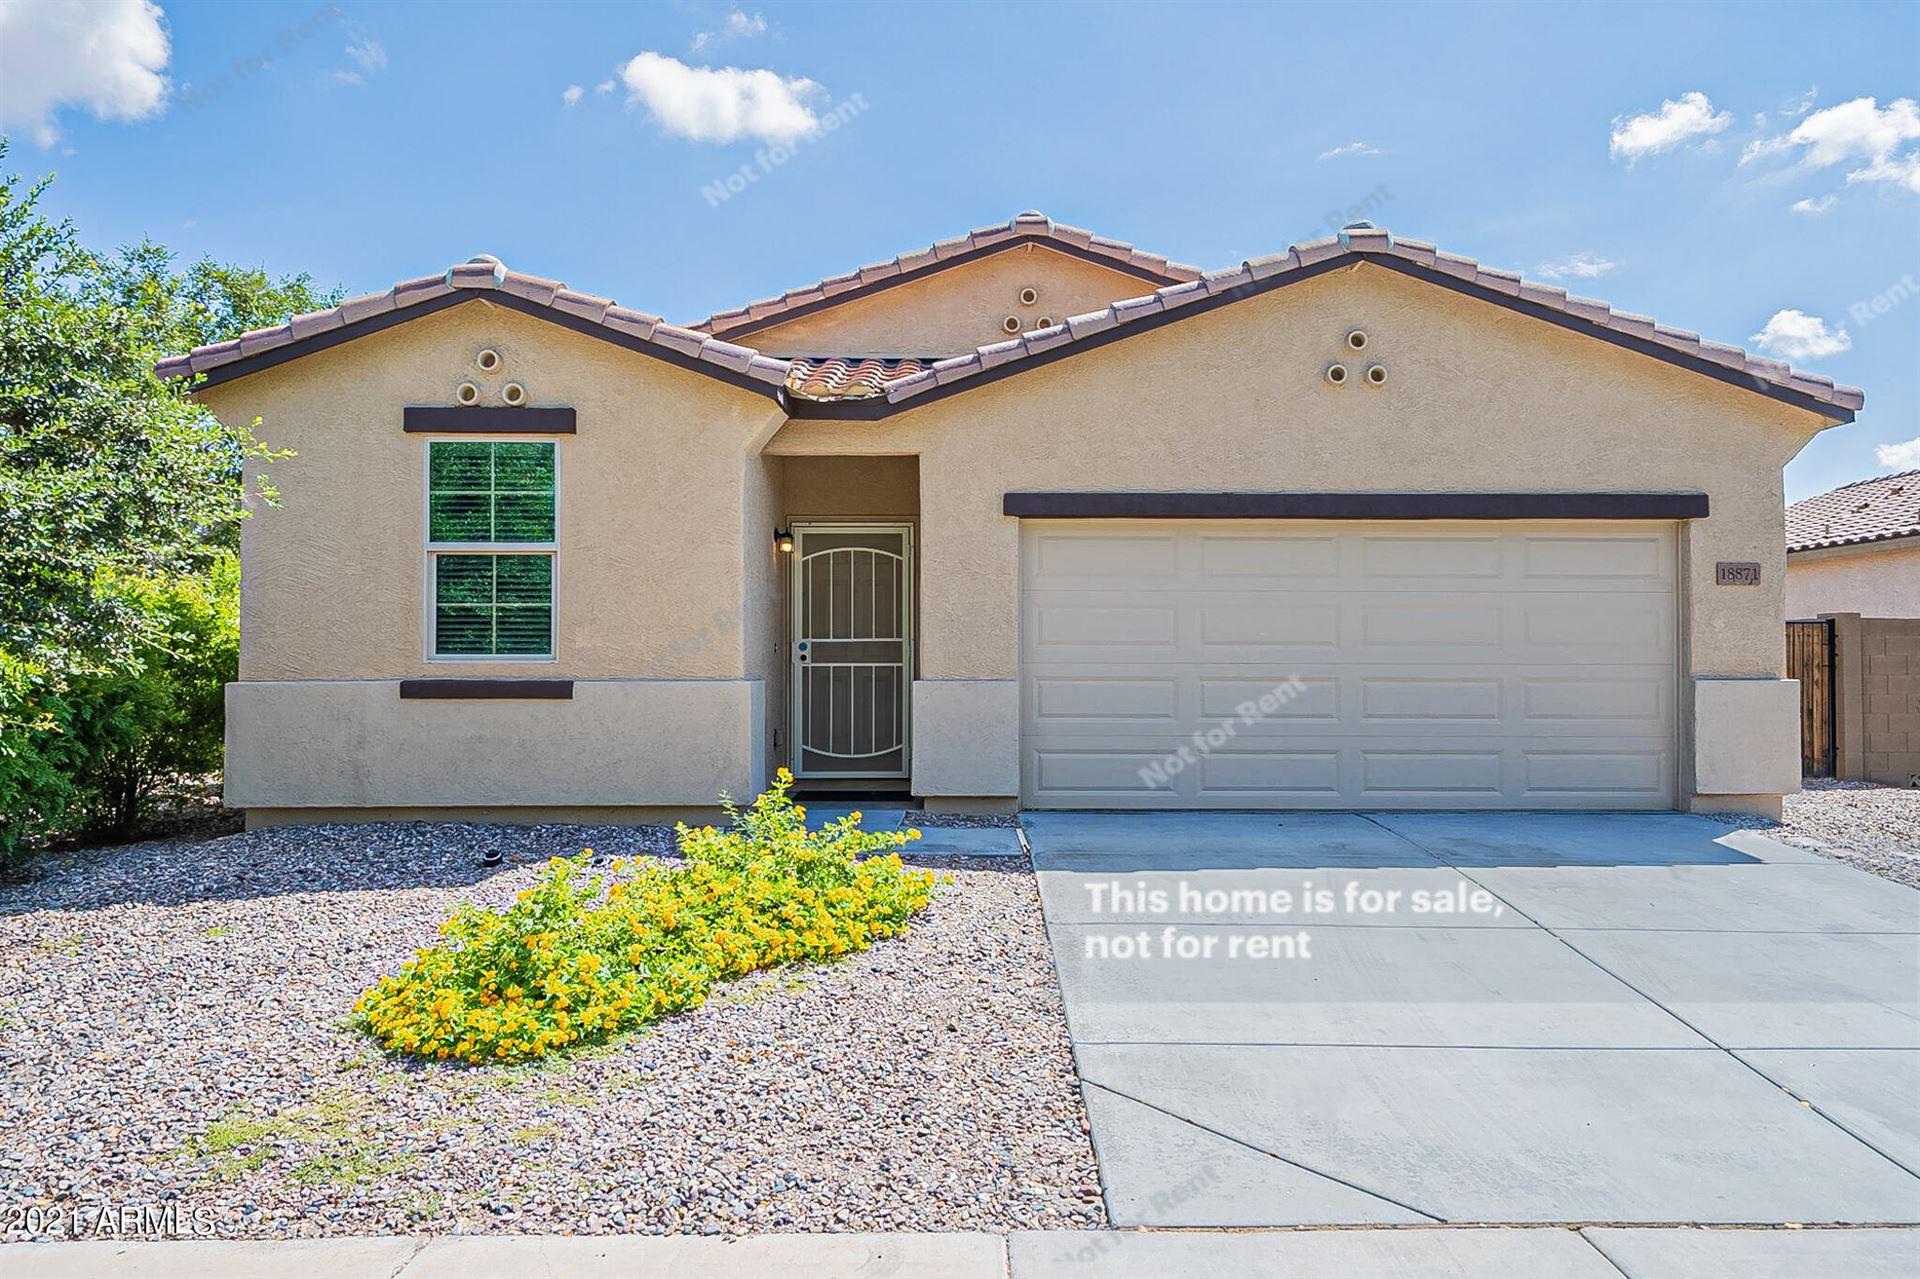 Photo for 18871 N VENTANA Lane, Maricopa, AZ 85138 (MLS # 6291141)